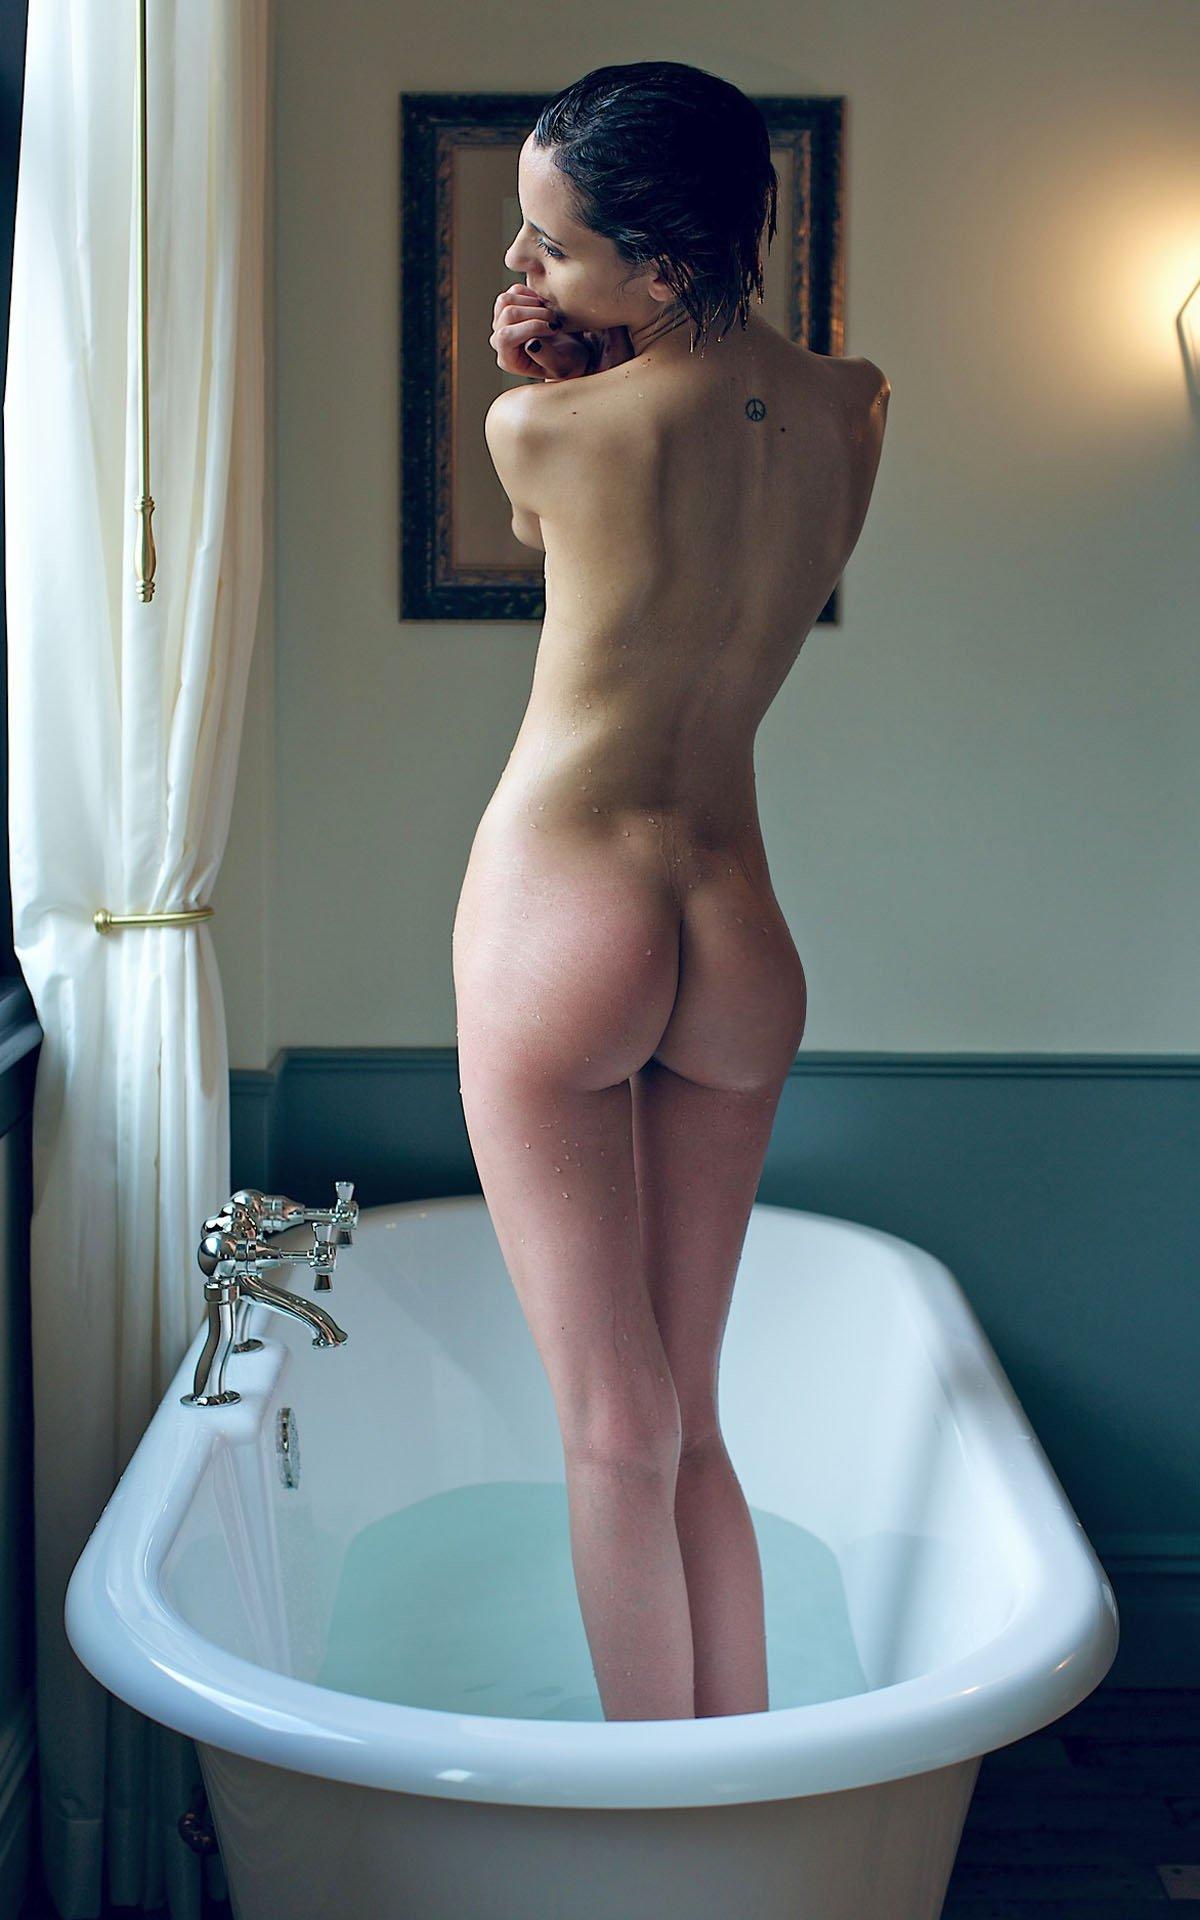 naked-girls-taking-bath-boobs-wet-mix-vol4-56